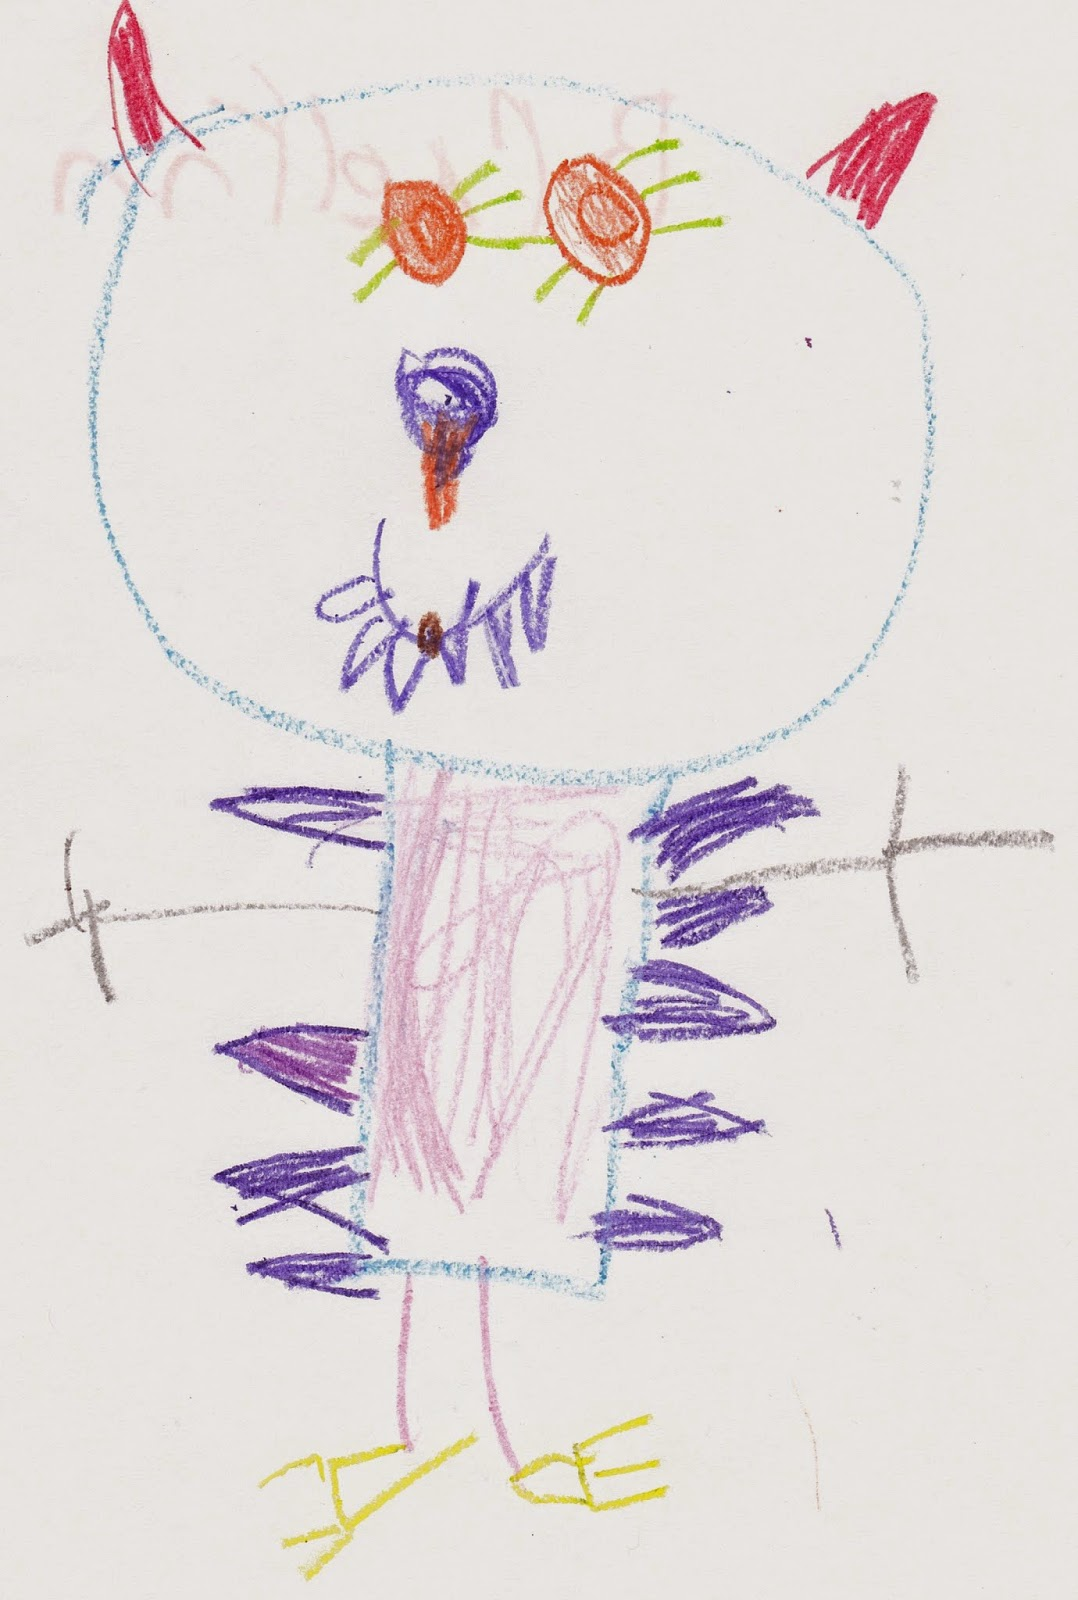 how to draw a gruffalo